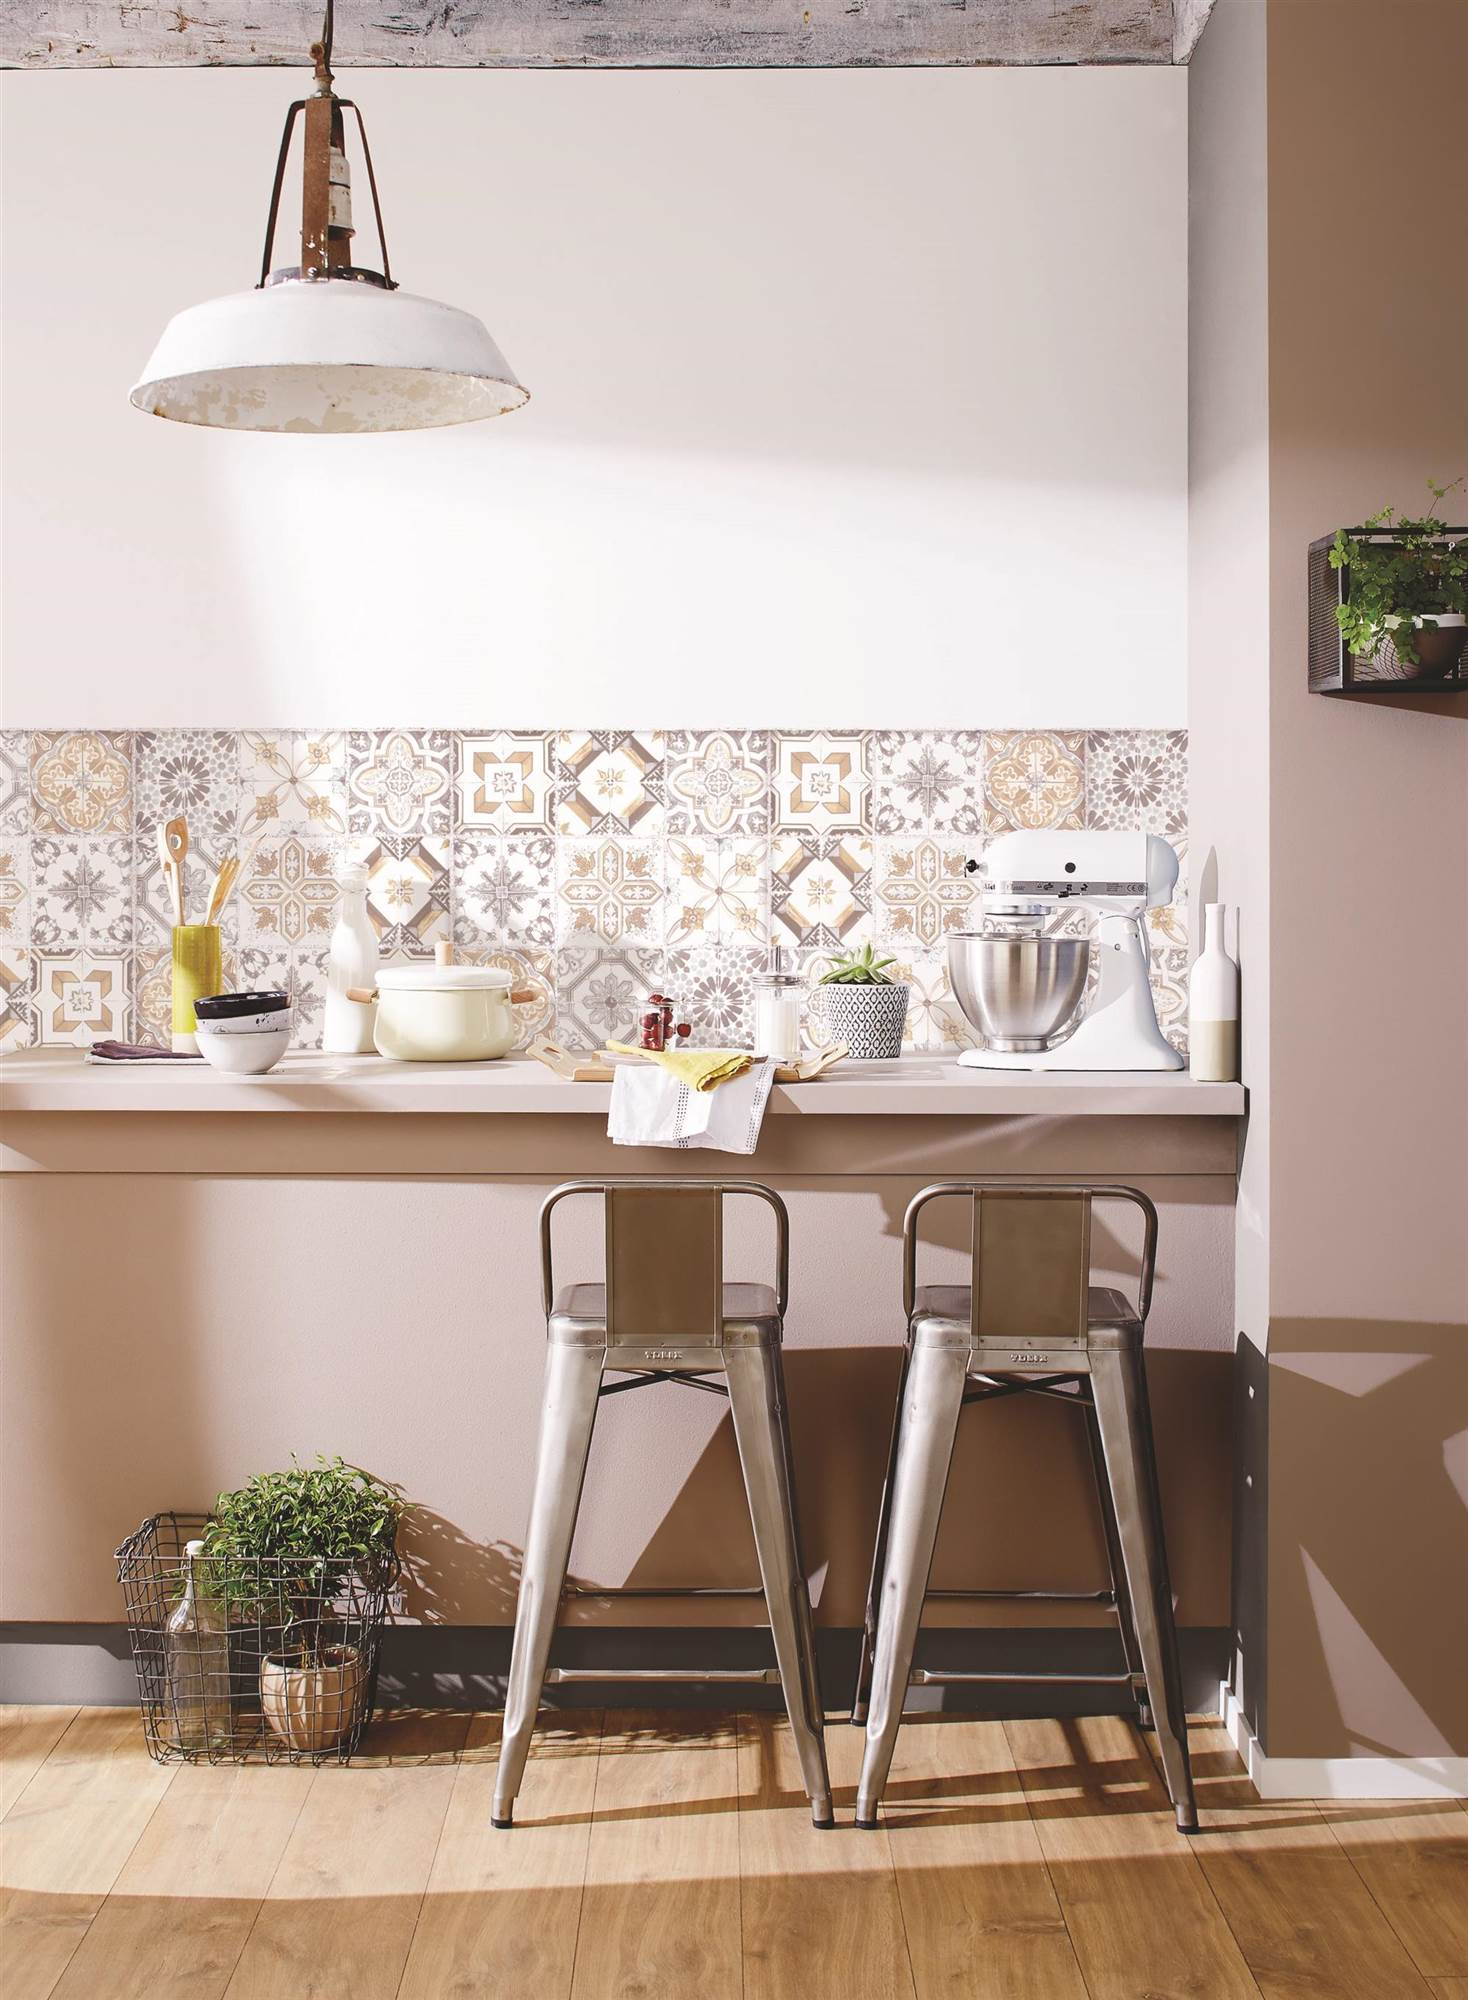 Cocinas muebles decoraci n dise o blancas o peque as - Papel vinilo para cocinas ...